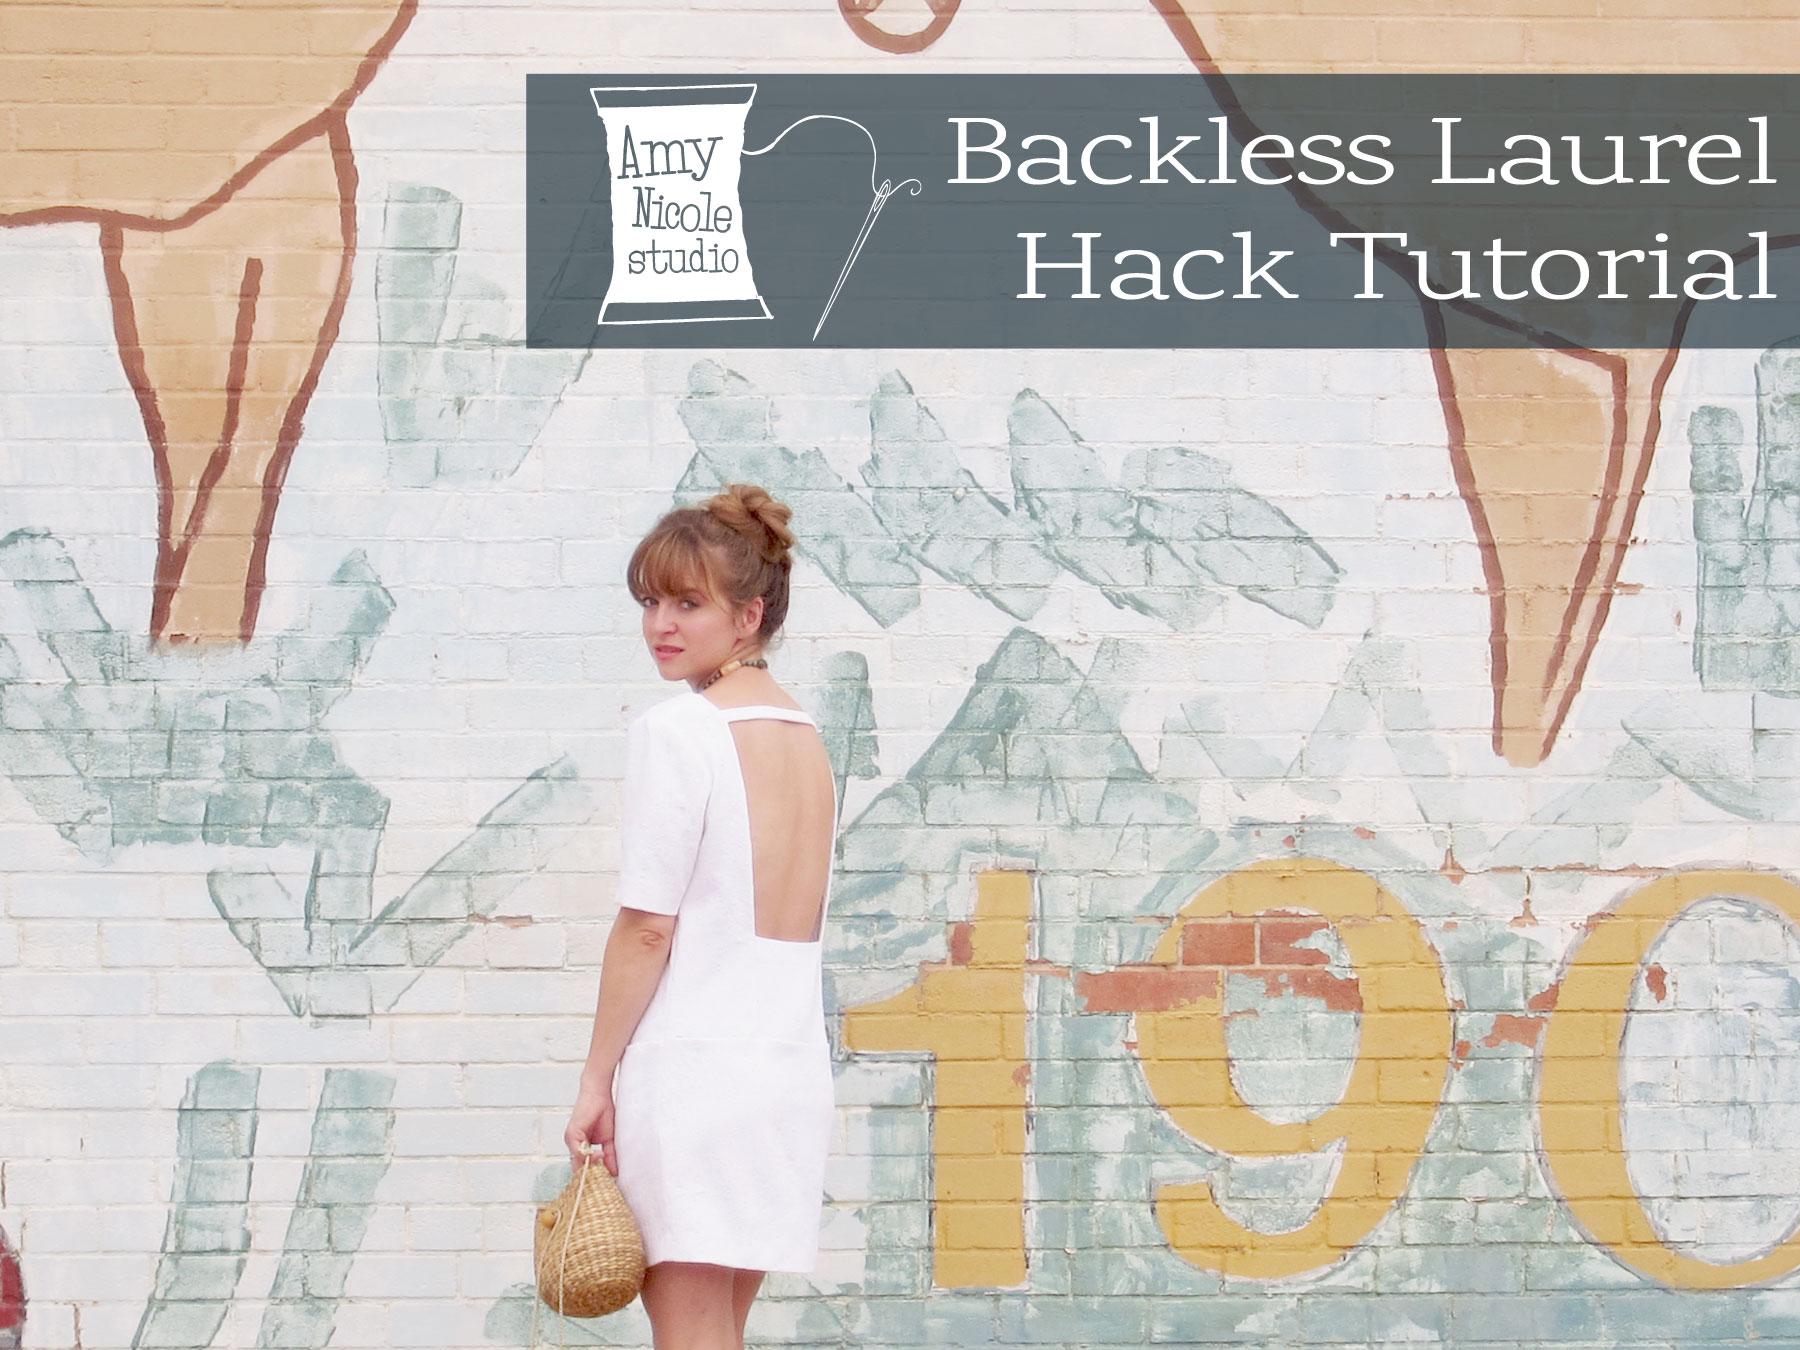 hack-title